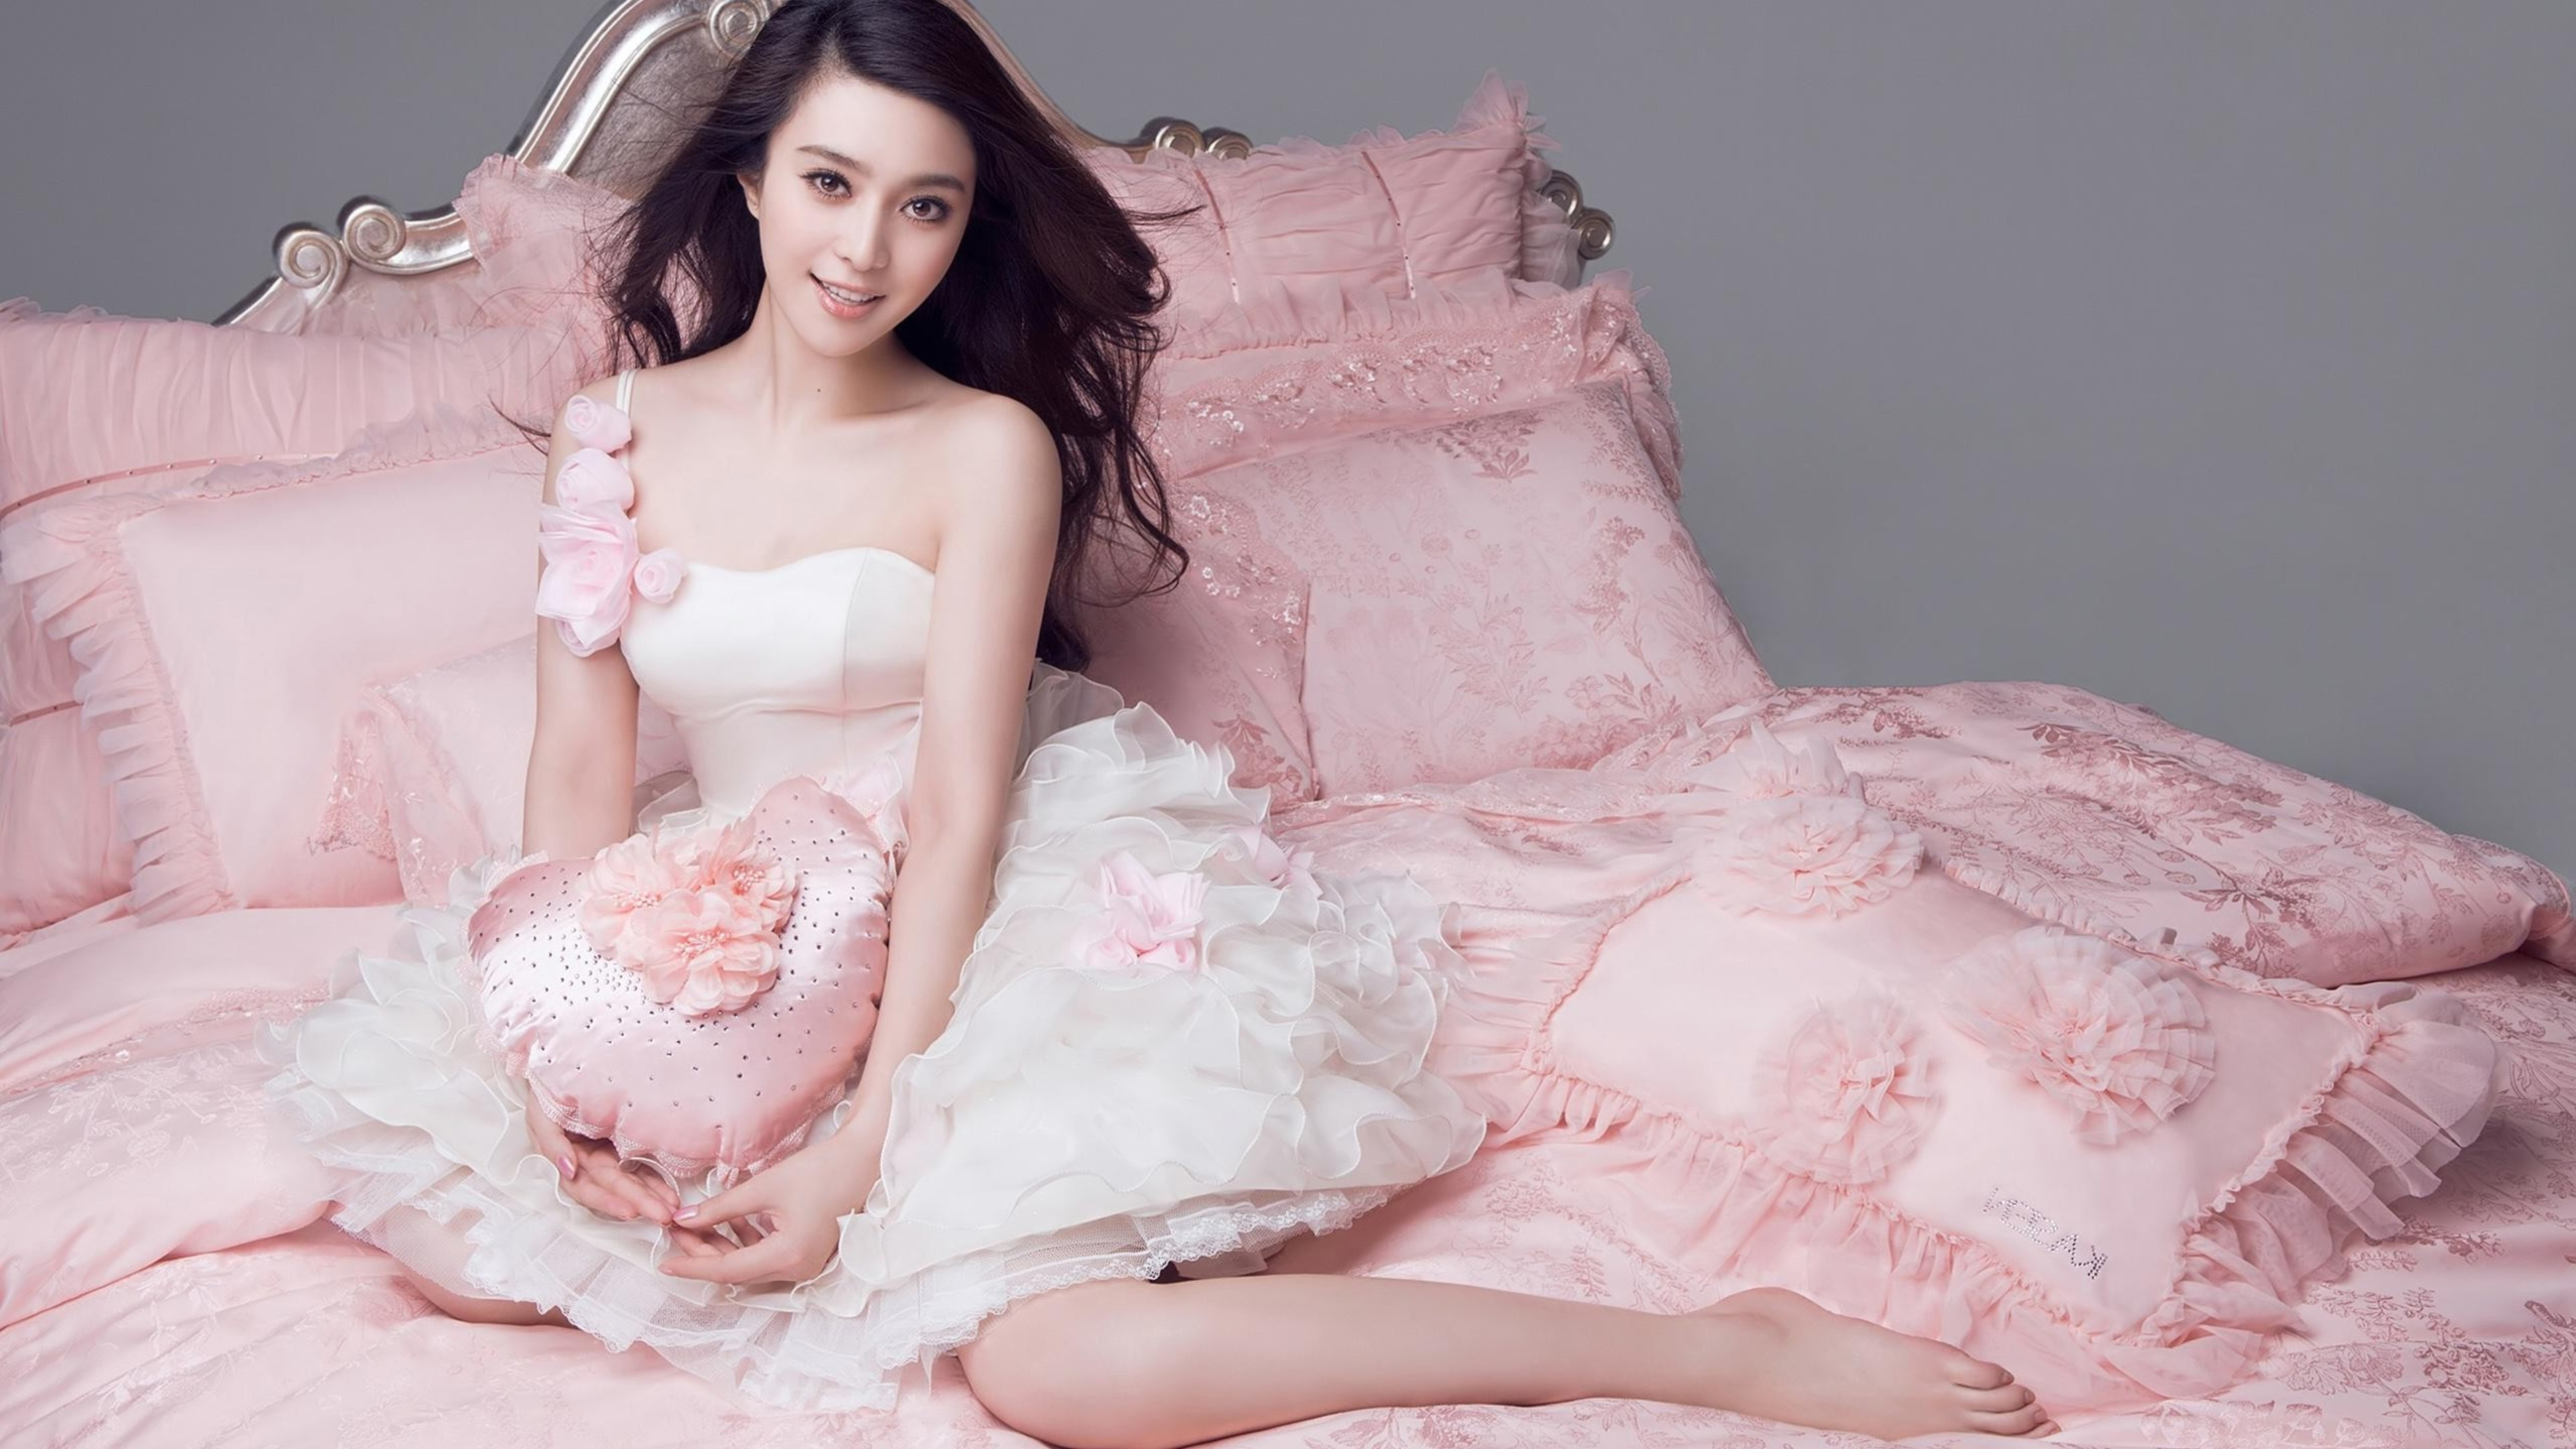 fan bingbing chinese actress, hd celebrities, 4k wallpapers, images